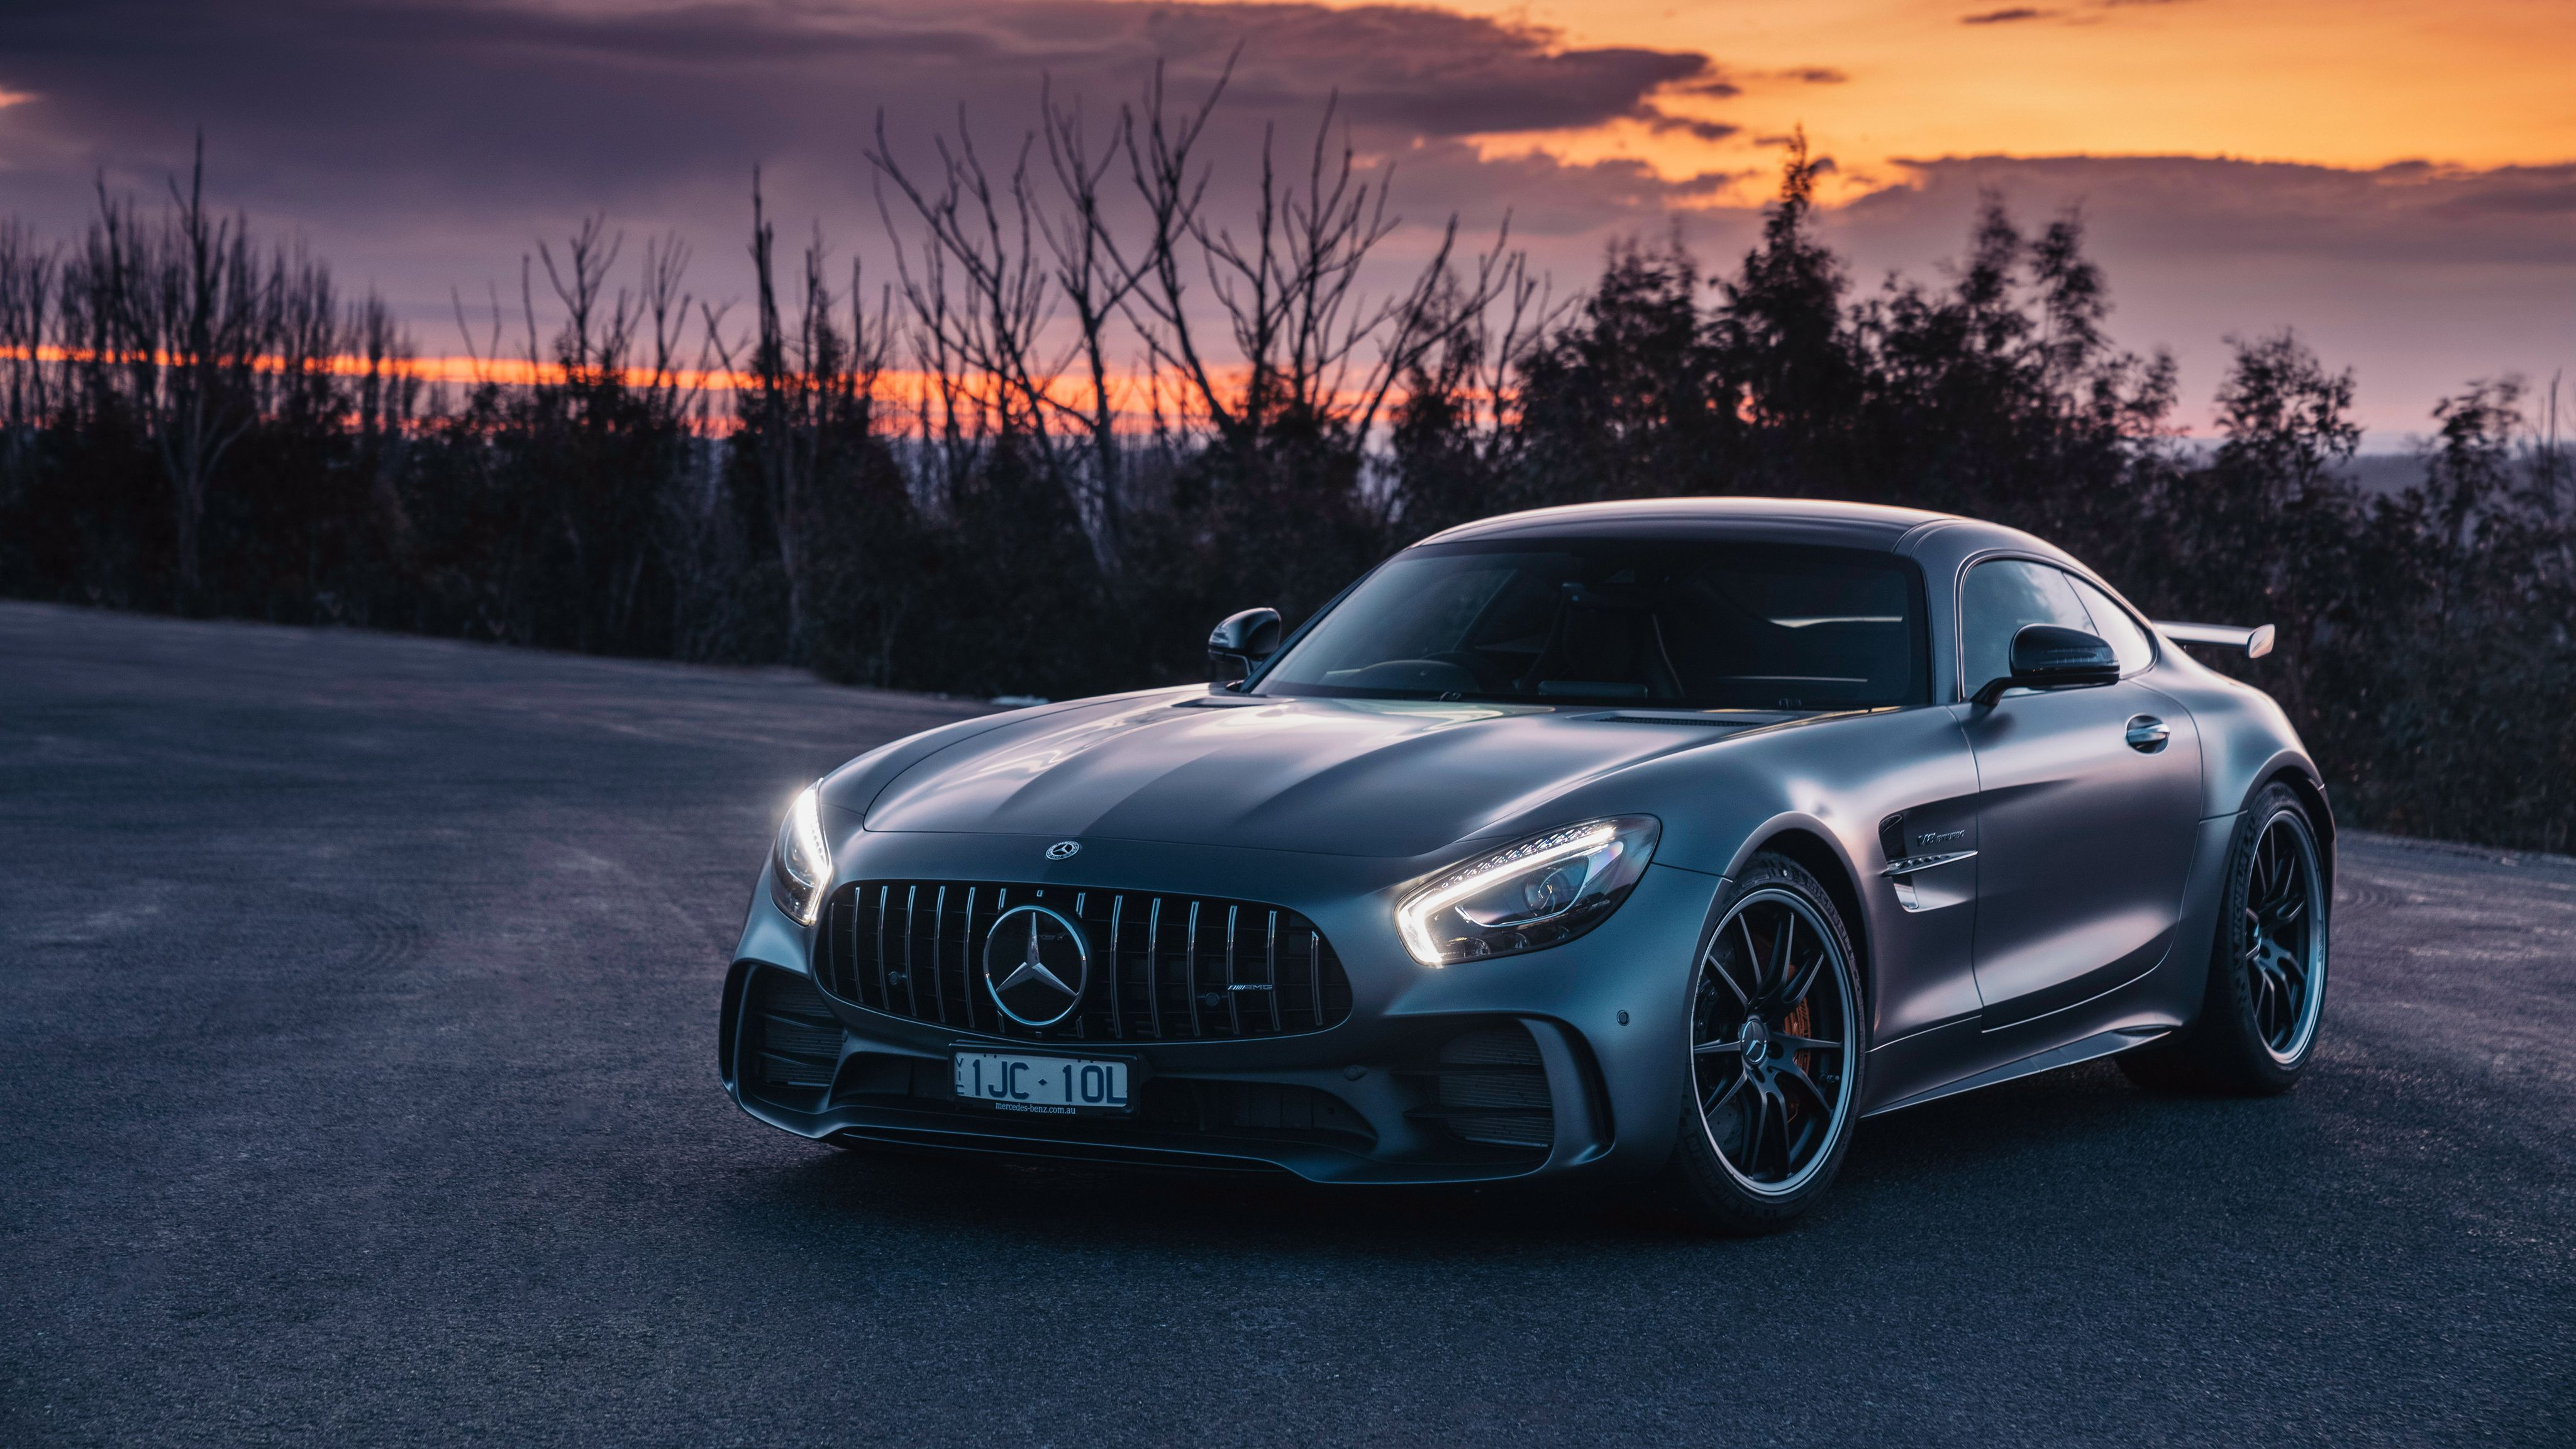 Mercedes Amg Gt R 2018 Hd 4k Mercedes Benz Wallpaper Mercedes Amg Gt R Mercedes Wallpaper 2017 mercedes amg gt r 2 wallpaper